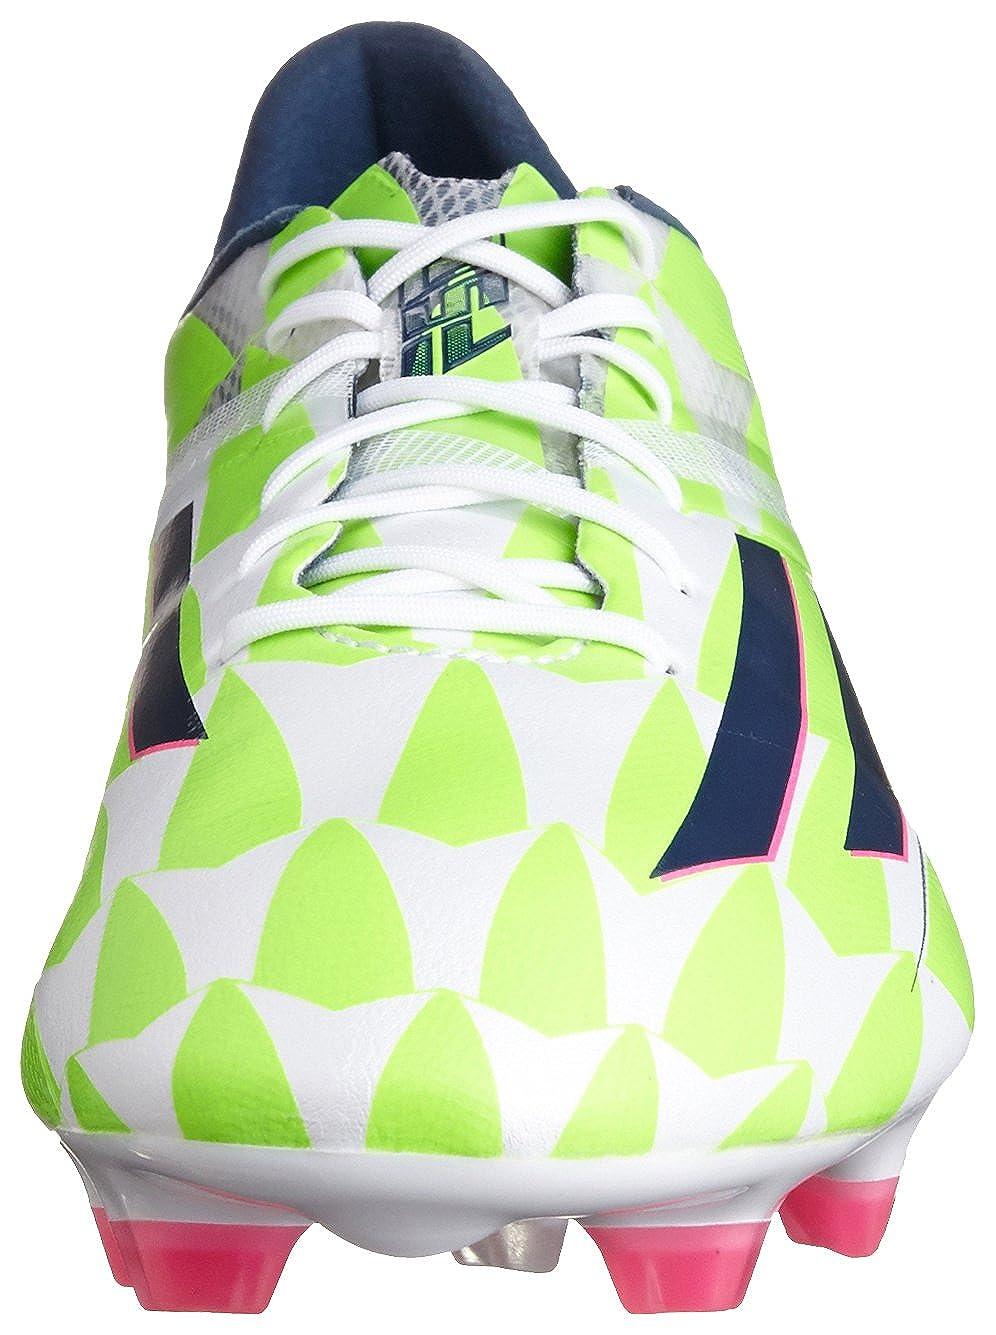 57404c14d F50 adizero TRX FG Football Boots Core White Rich Blue Solar Green - size  11  Amazon.co.uk  Shoes   Bags